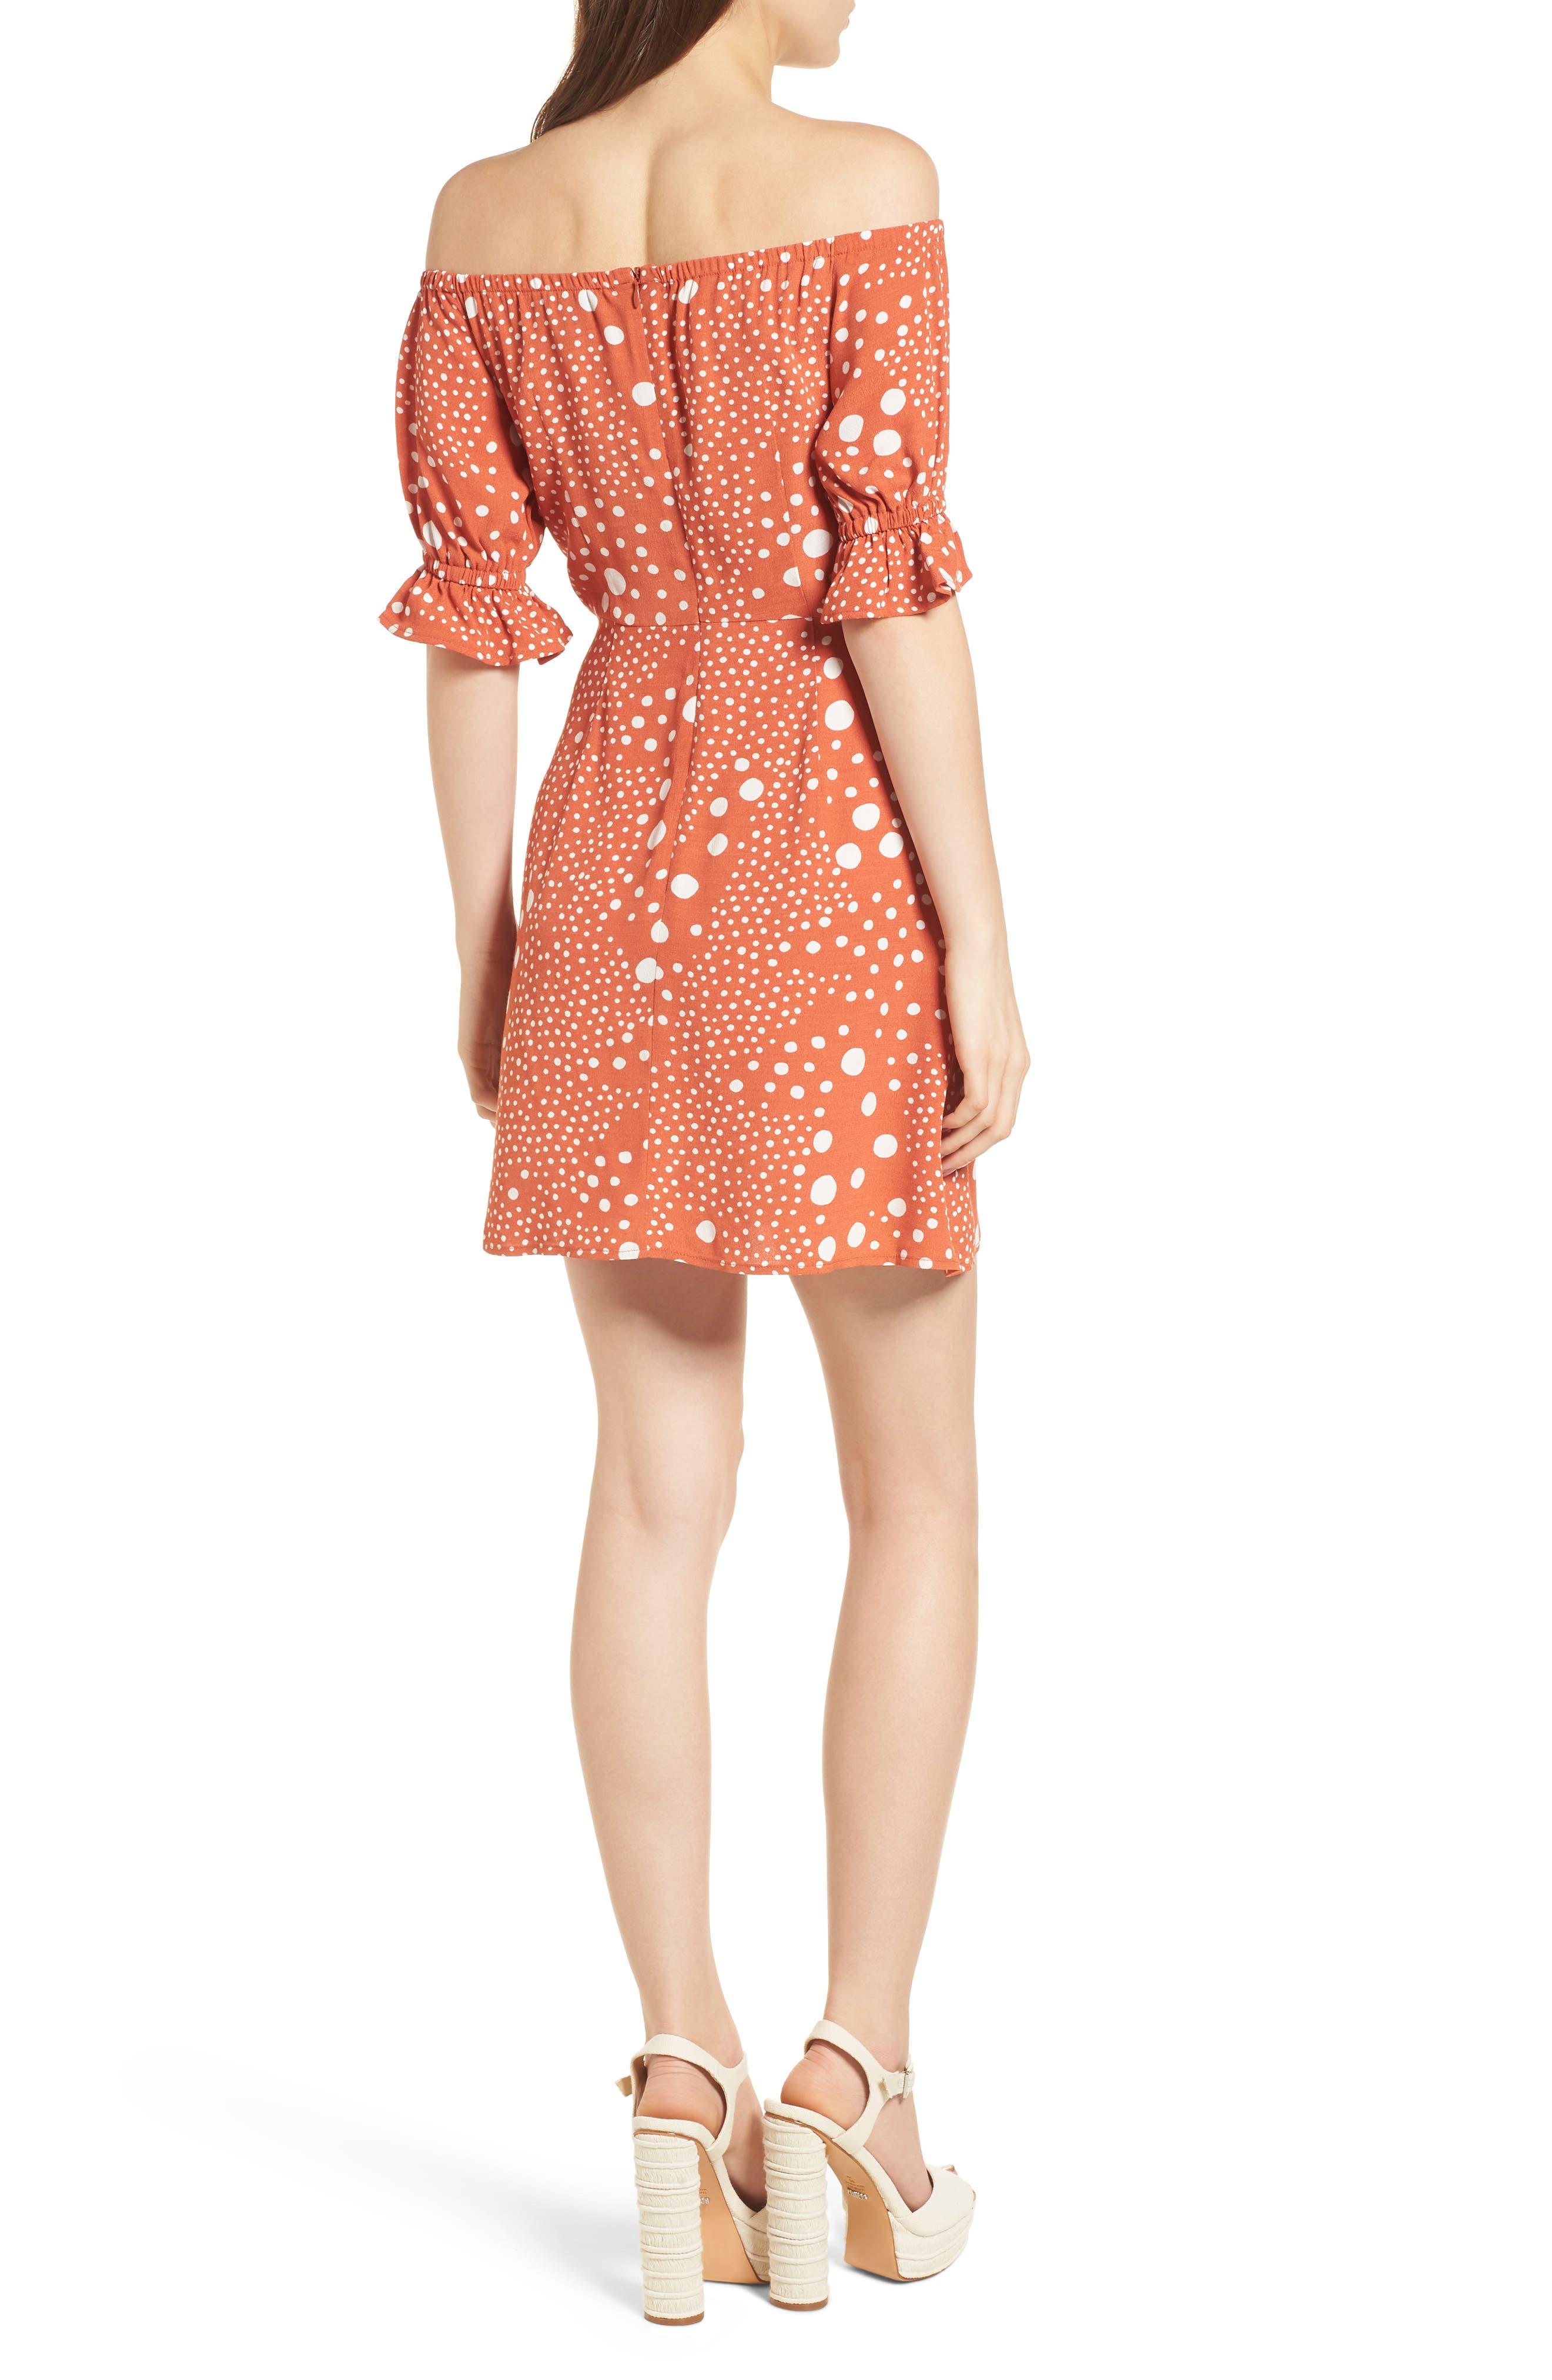 Peppers Polka Dot Off the Shoulder Dress,                             Alternate thumbnail 3, color,                             Rust Pebble